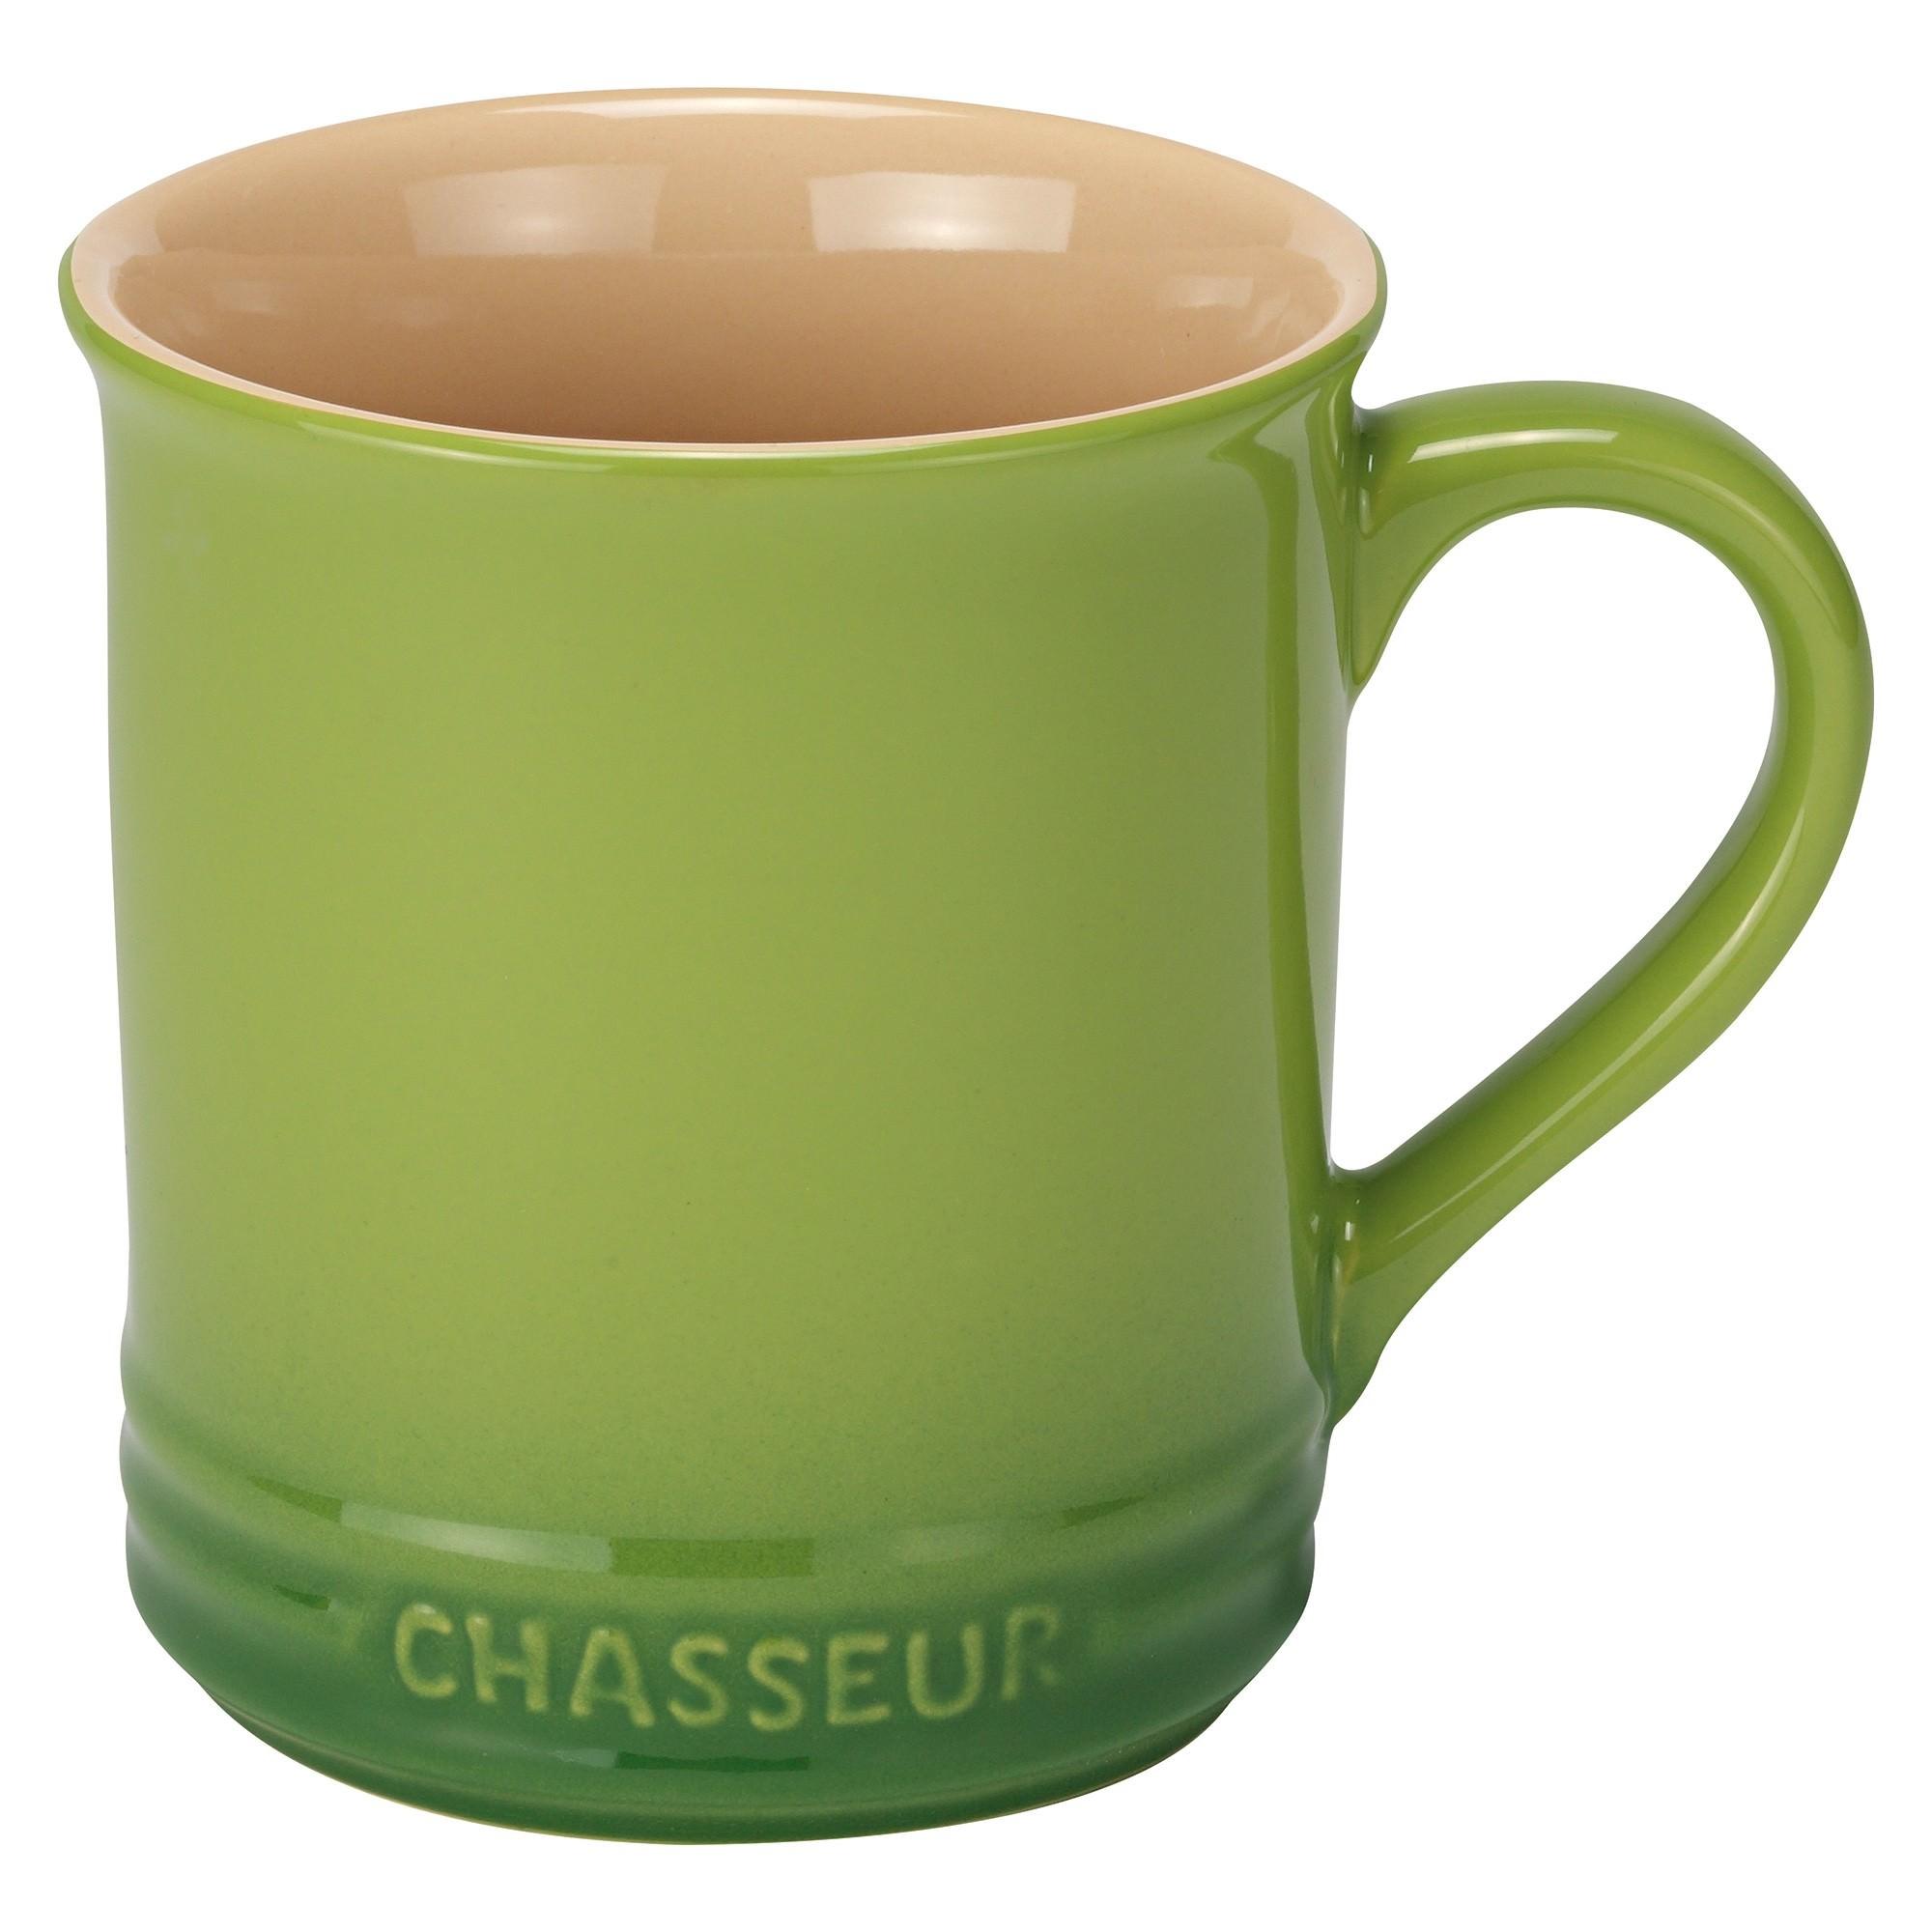 Chasseur La Cuisson Mug, 350ml, Apple Green